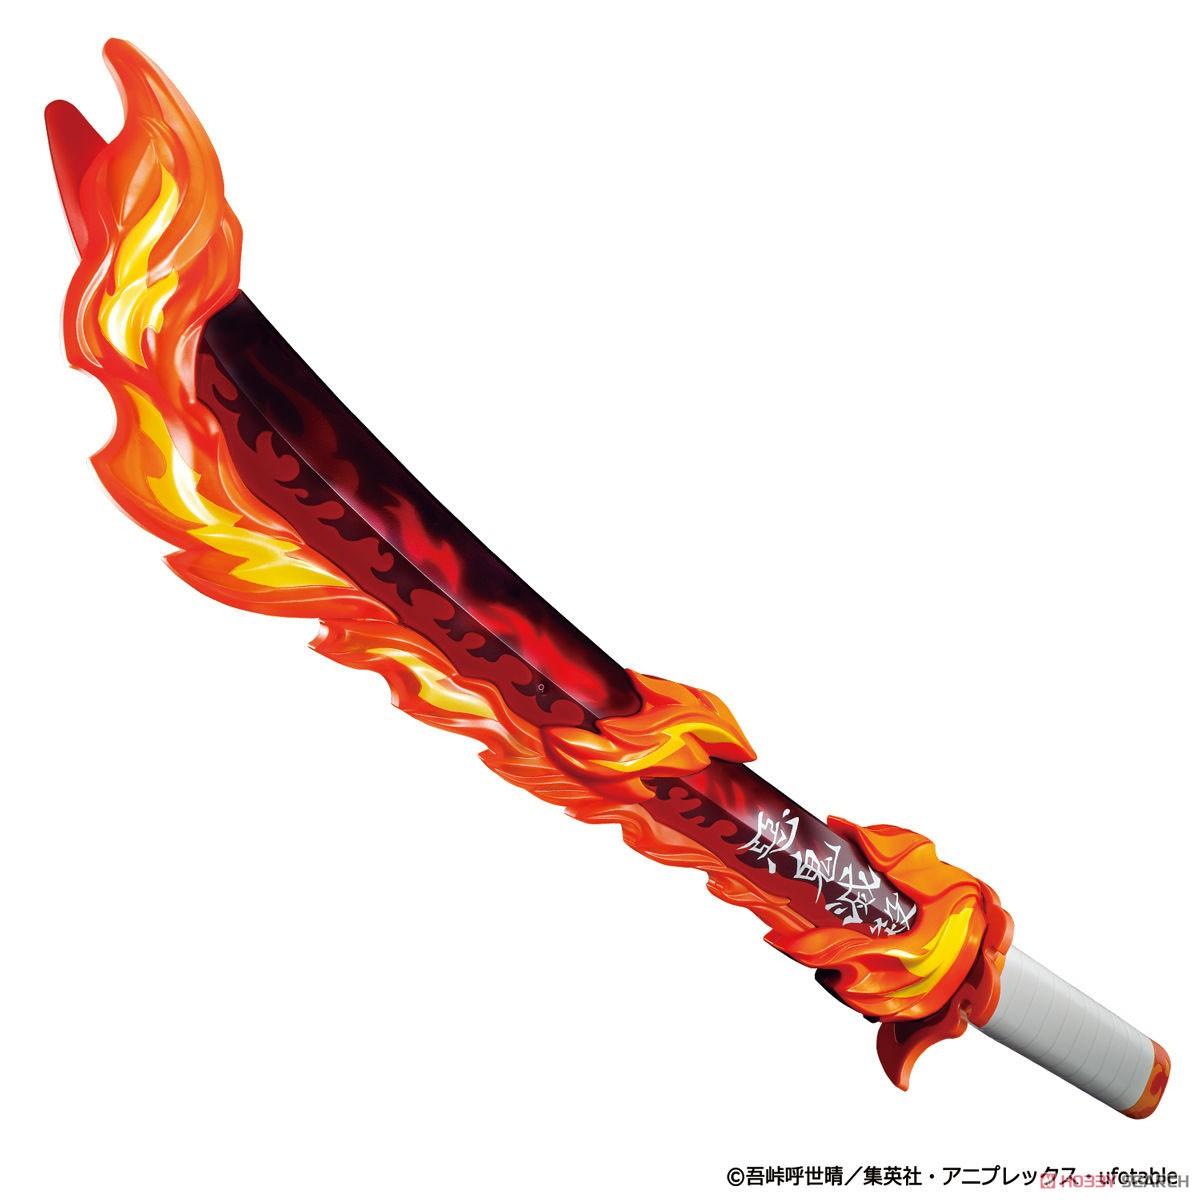 BANDAI|鬼滅之刃 DX日輪刀 煉獄杏壽郎版本